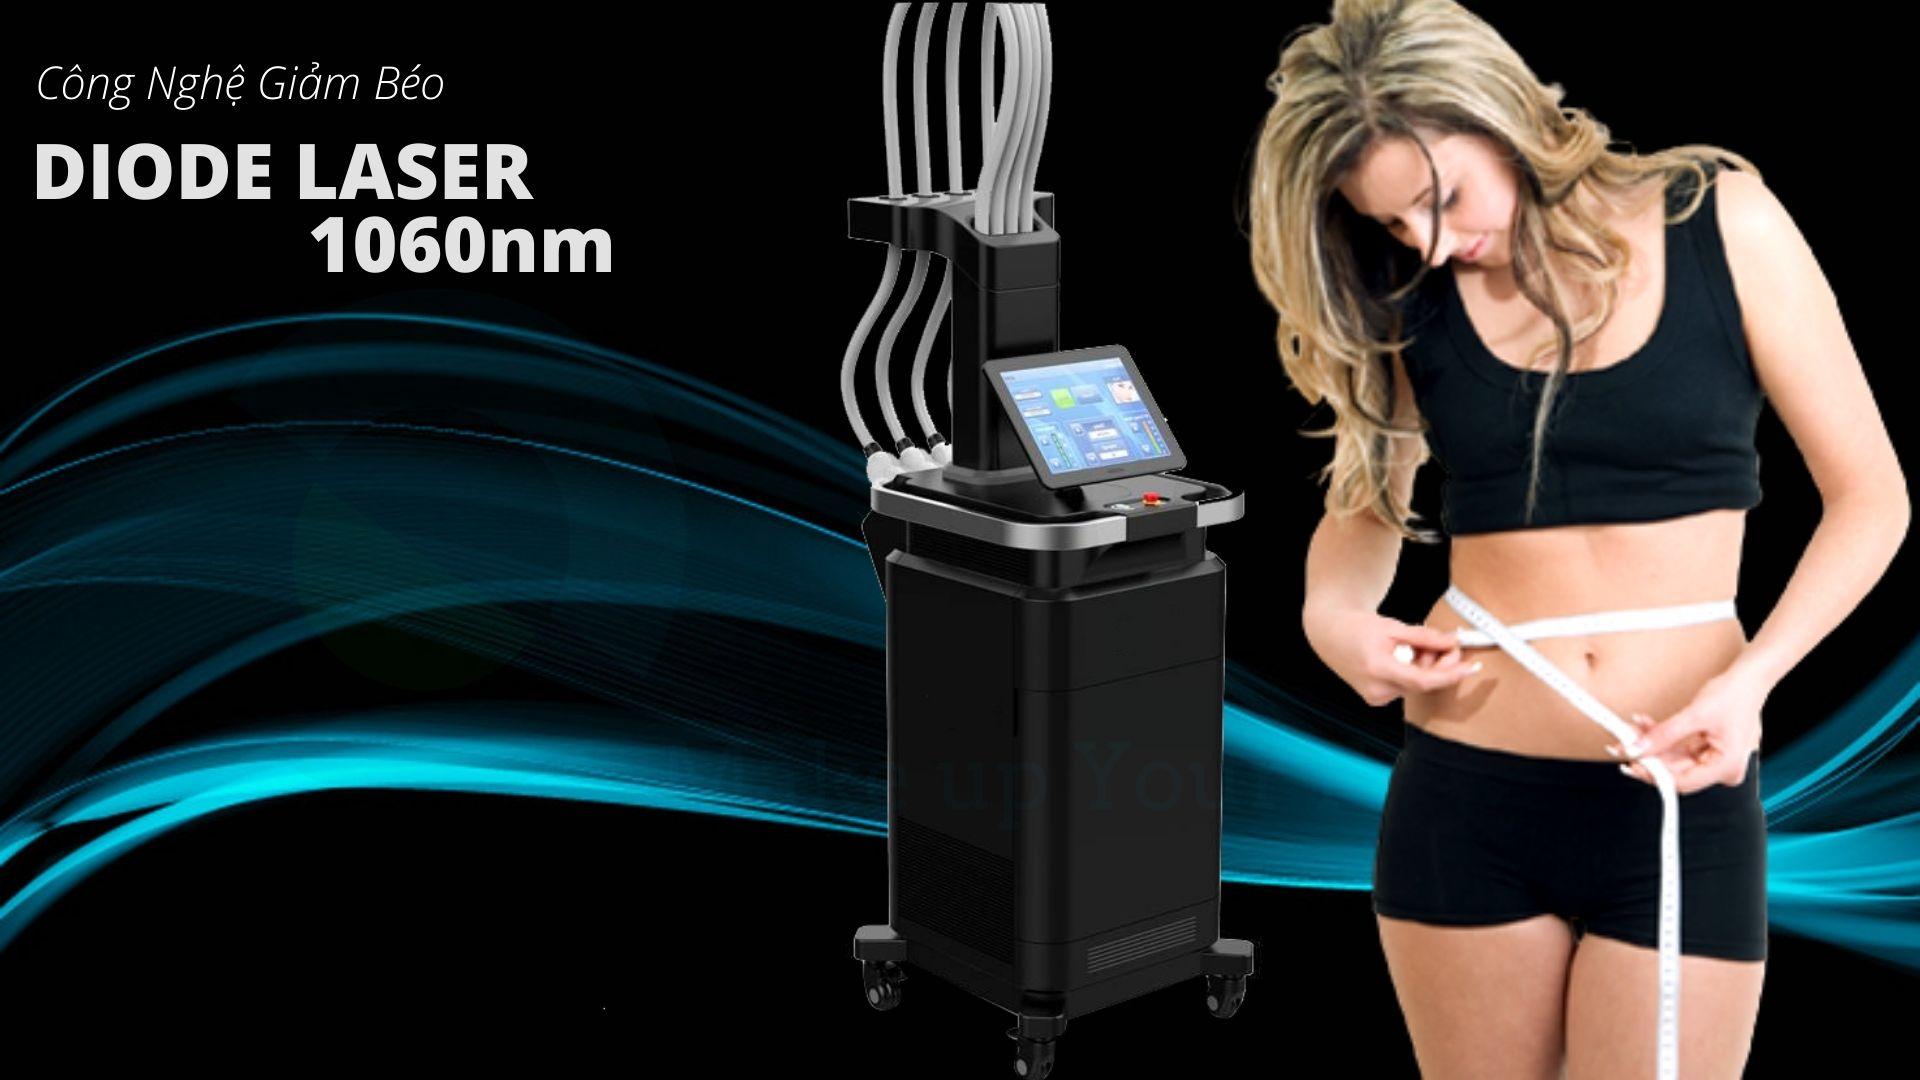 Giảm béo diode laser 1060nm